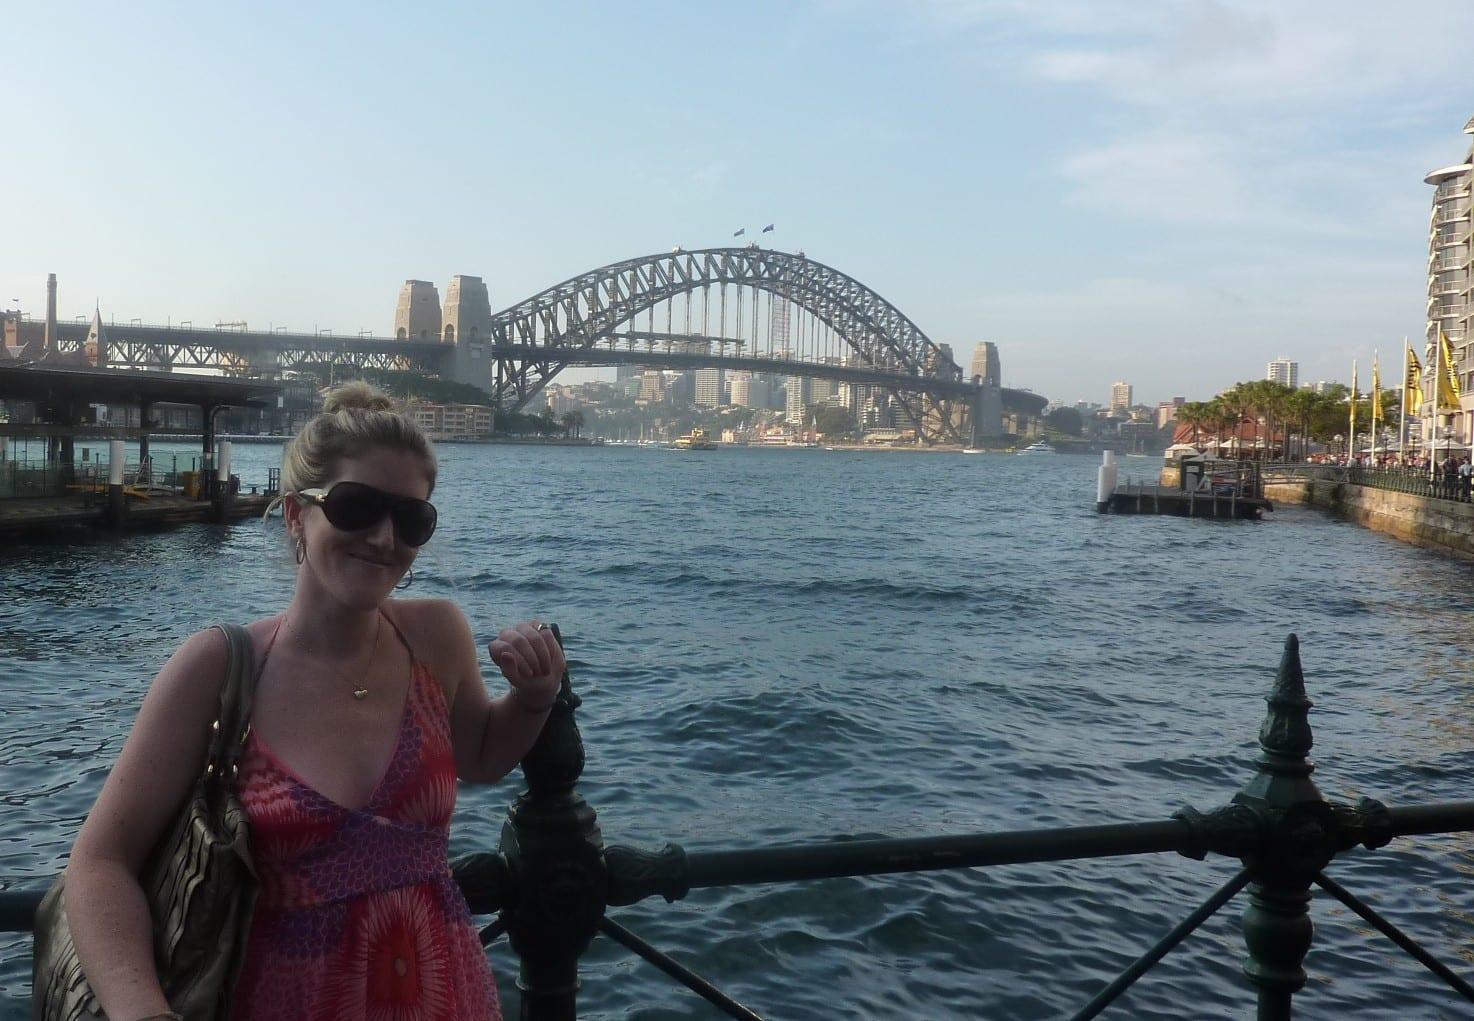 TESOL Australia: Visa, insurance, and teaching English in Australia